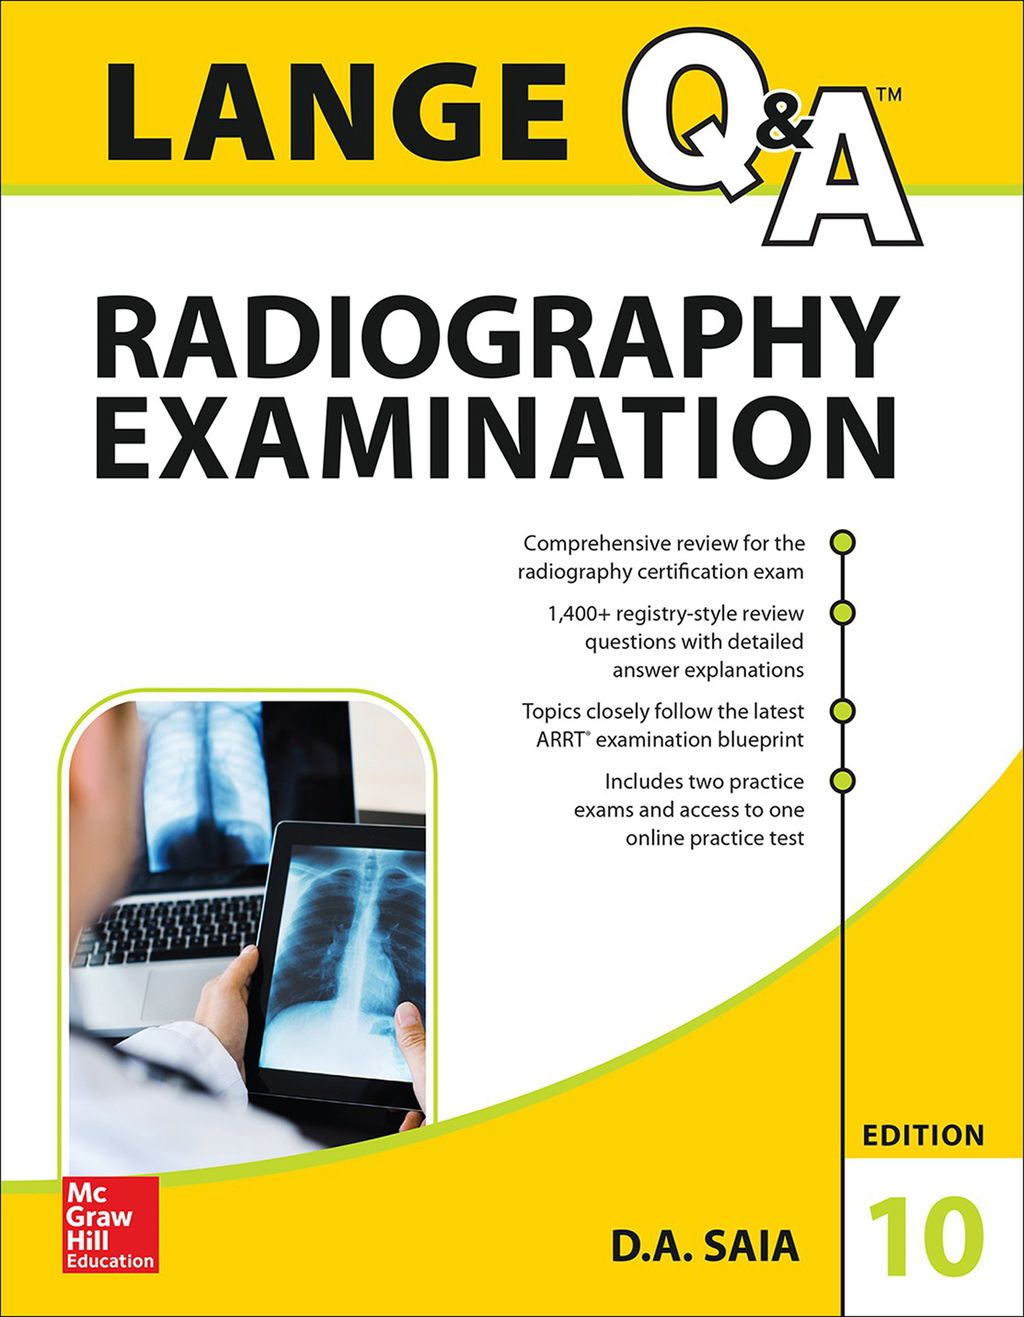 Lange Q A Radiography Examination Tenth Edition Ebook